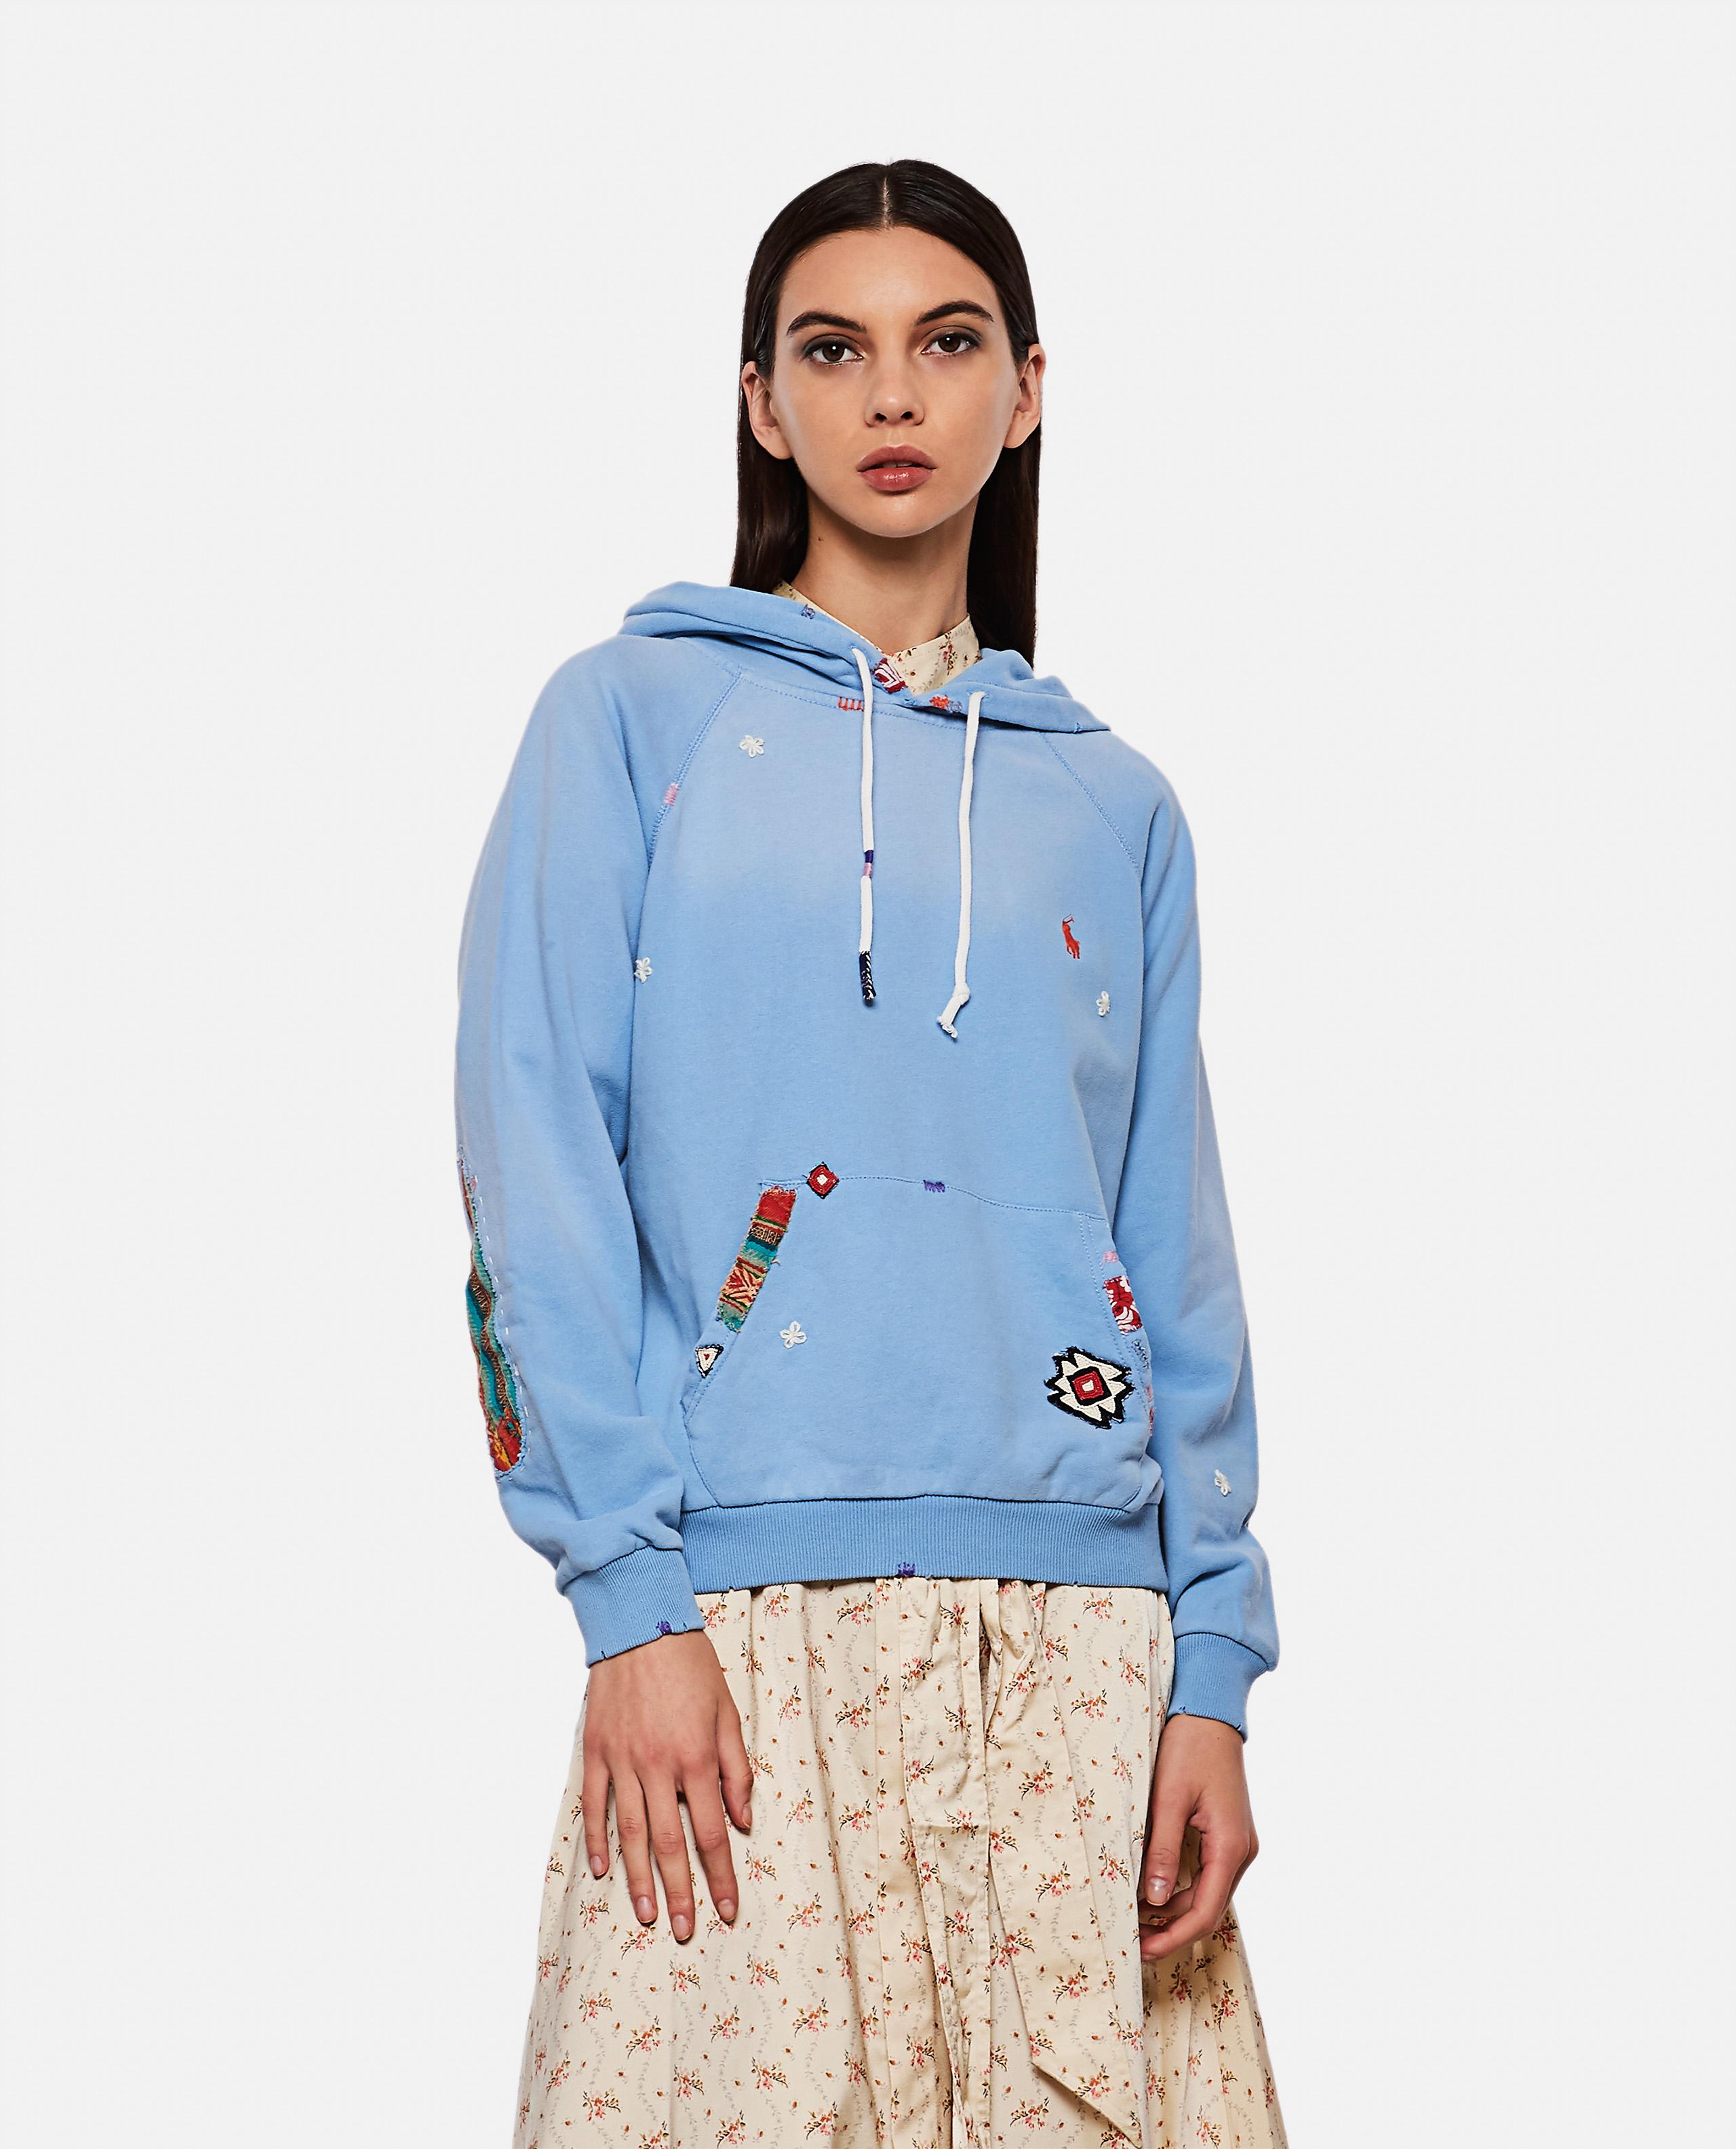 Sweatshirt with patchwork design